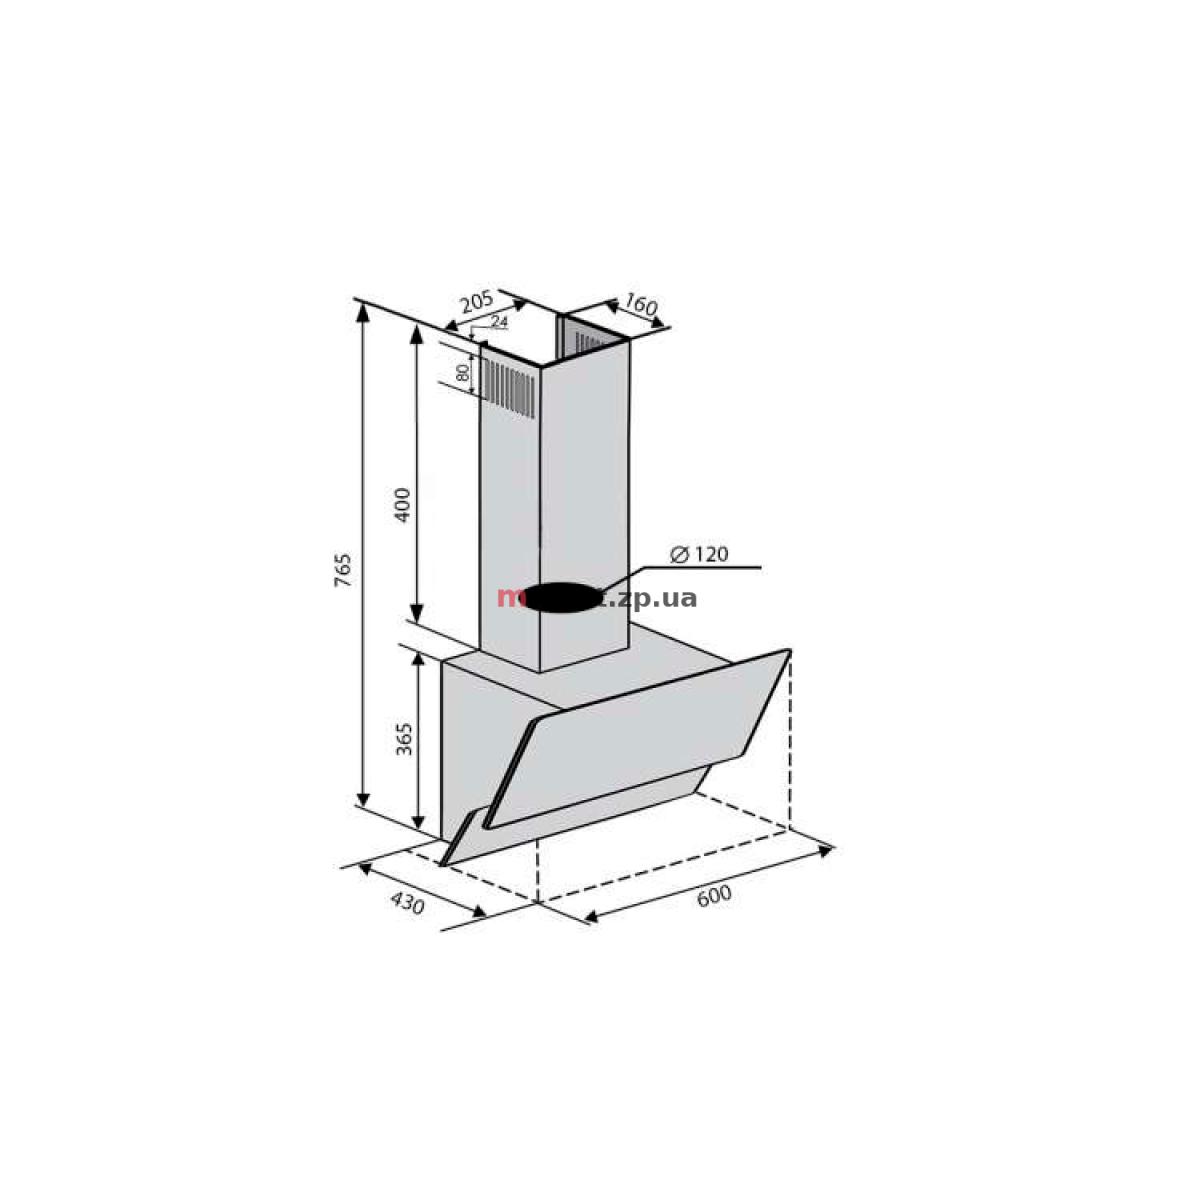 Вытяжка VENTOLUX RIMINI 60 BK (650) TRC